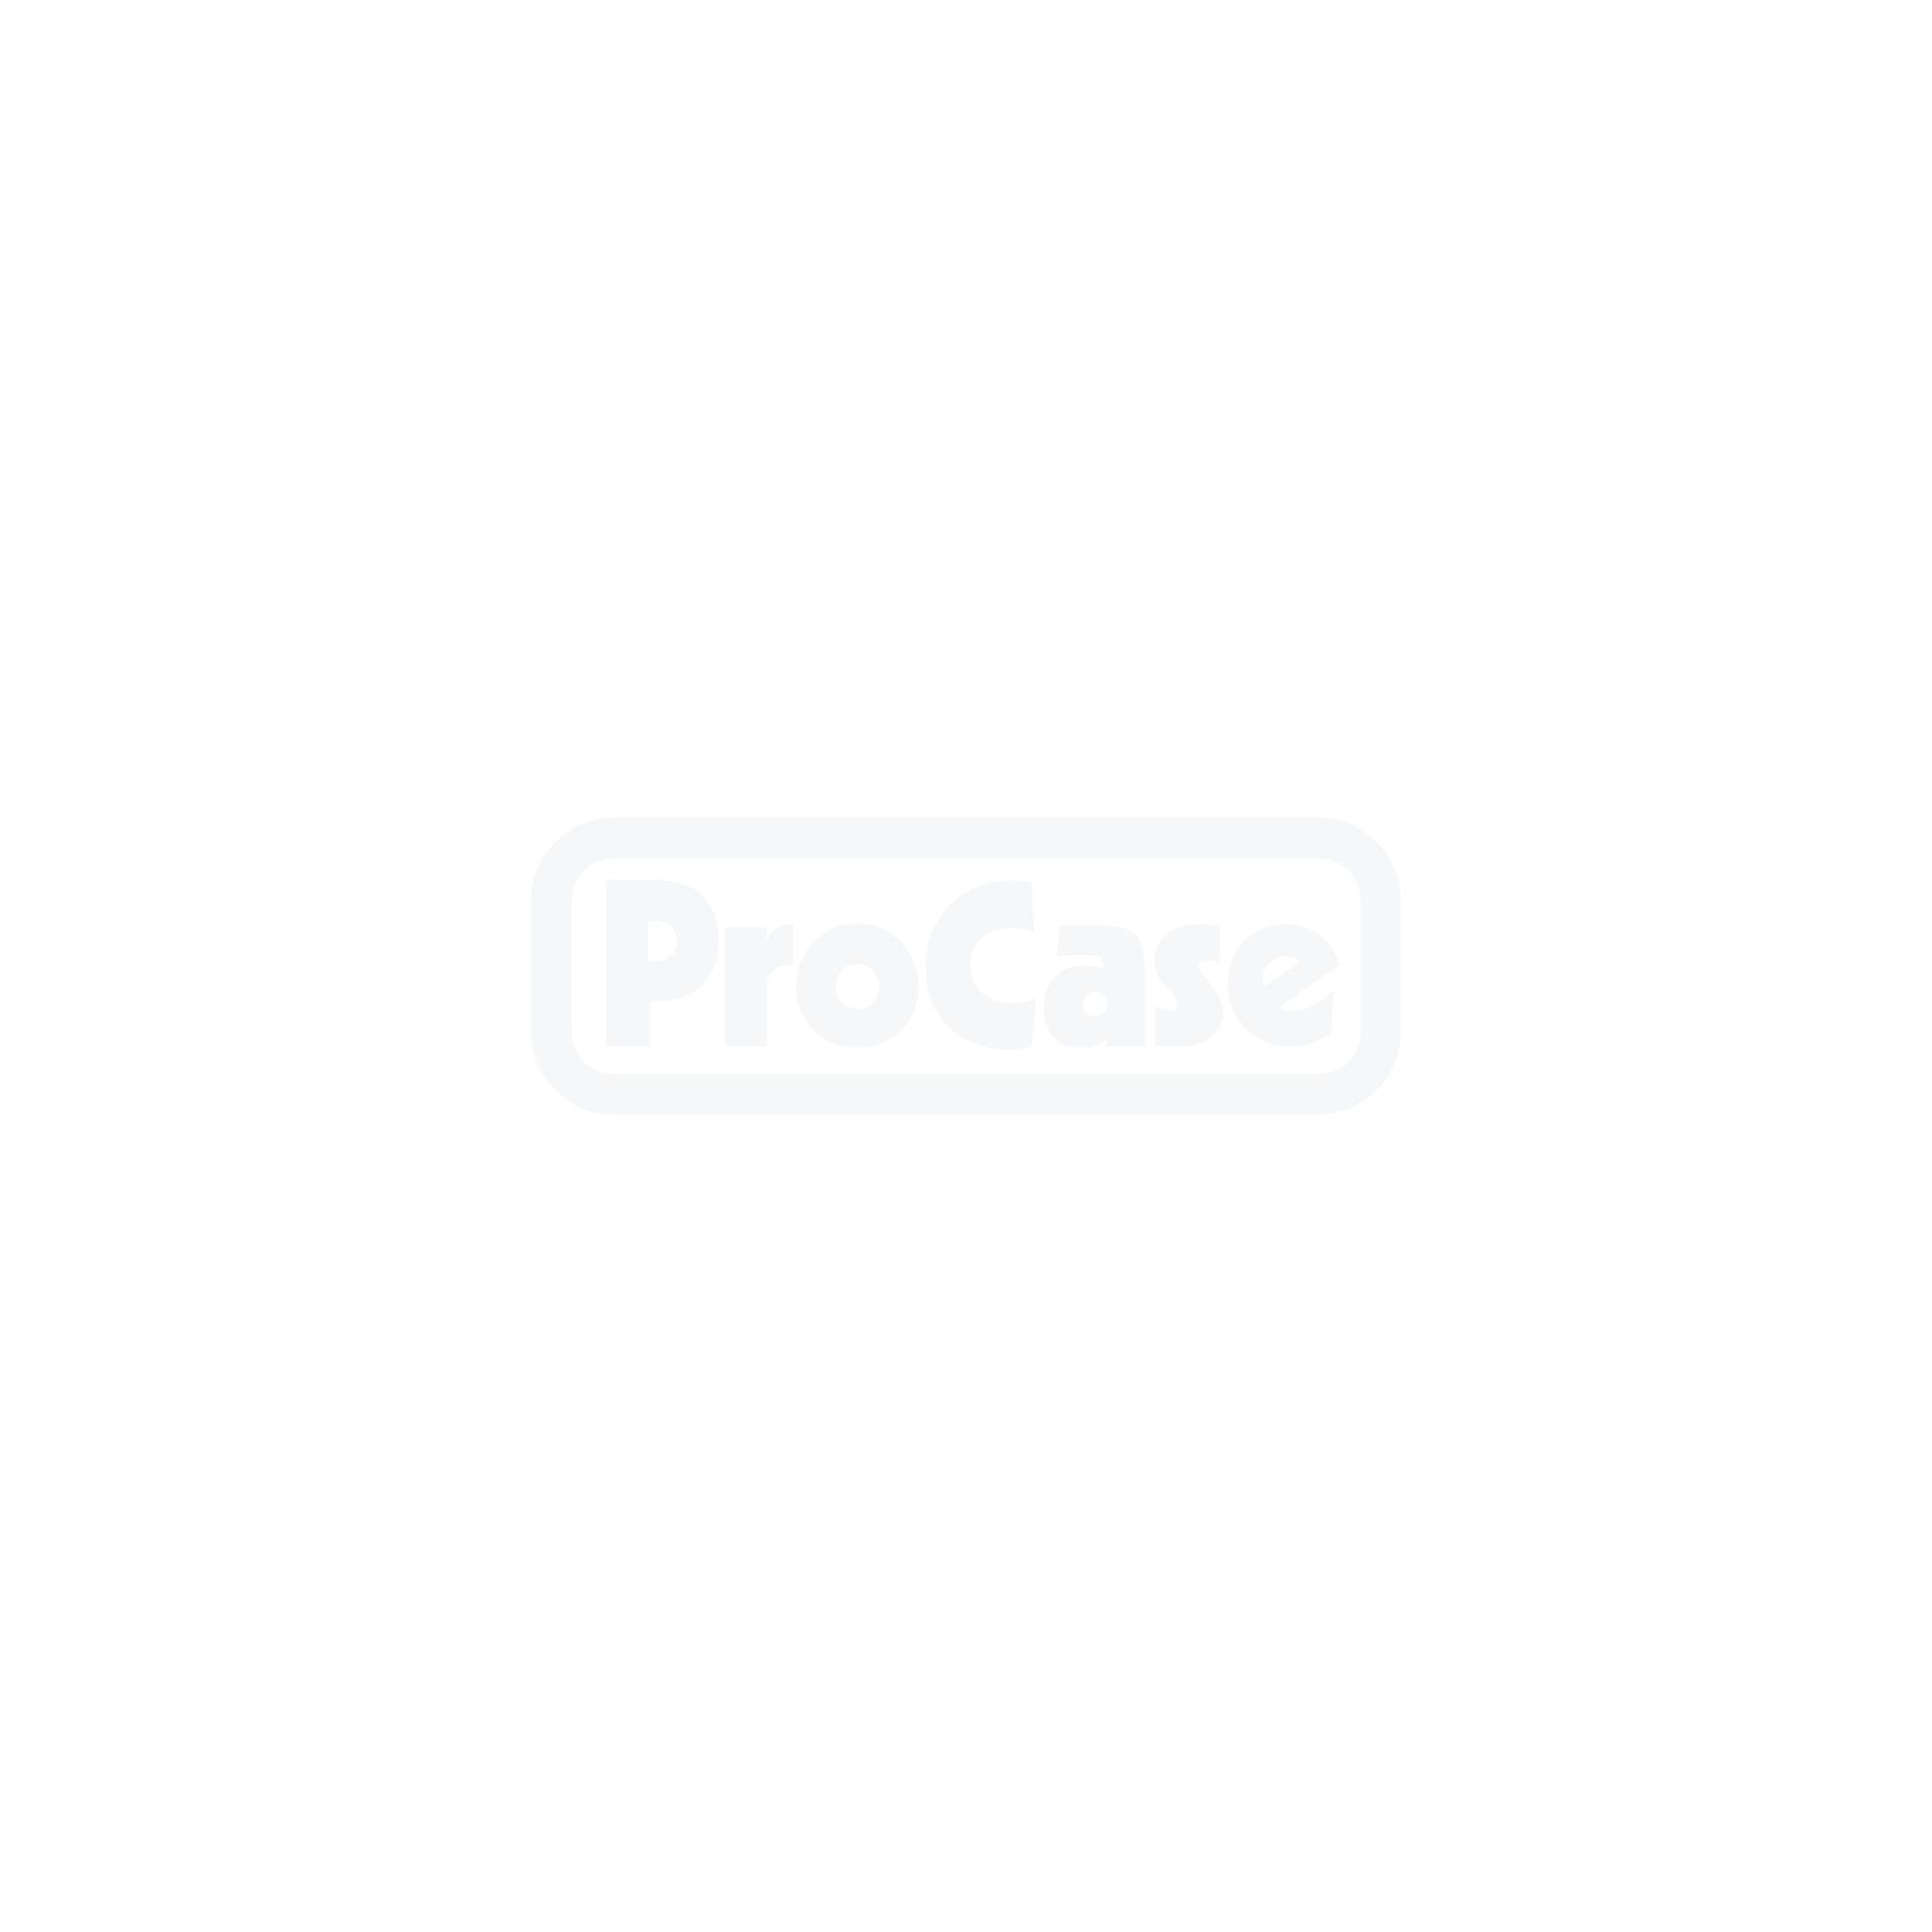 Flightcase für Dallmayr Riva Pronto S Kaffeevollautomat